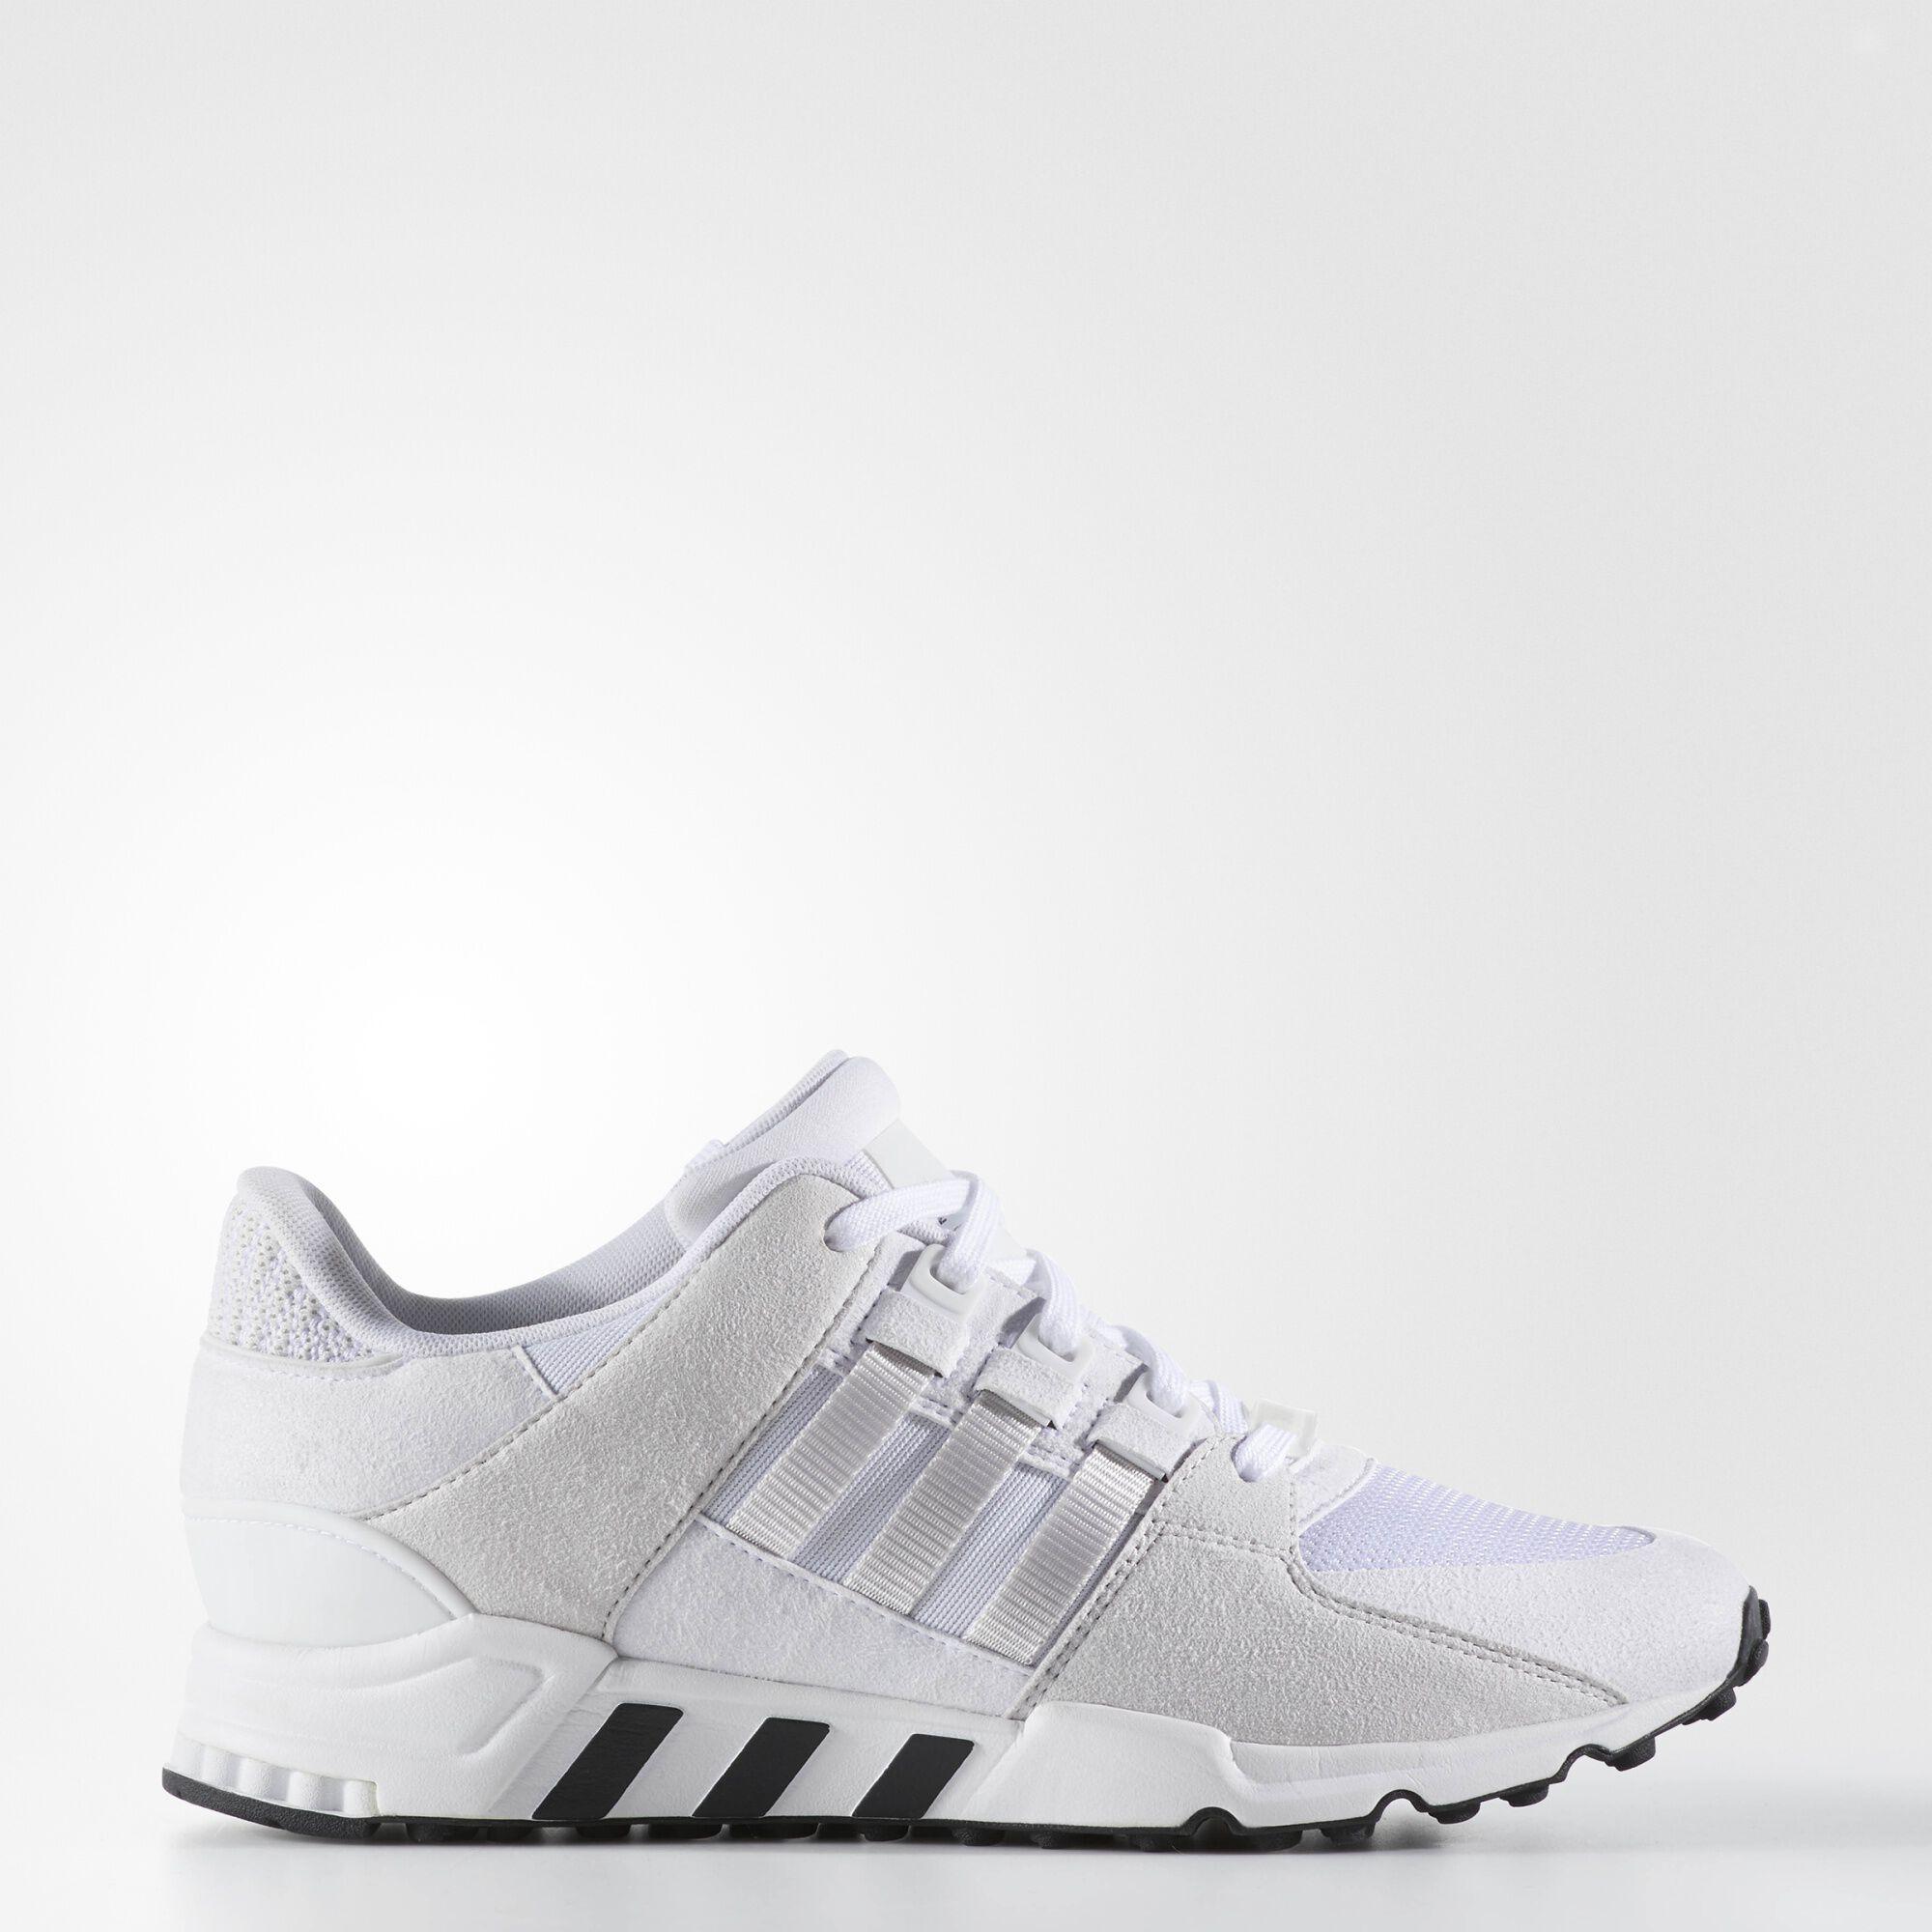 adidas nmd_r1 primeknit core black white adidas shoes for boys size 25